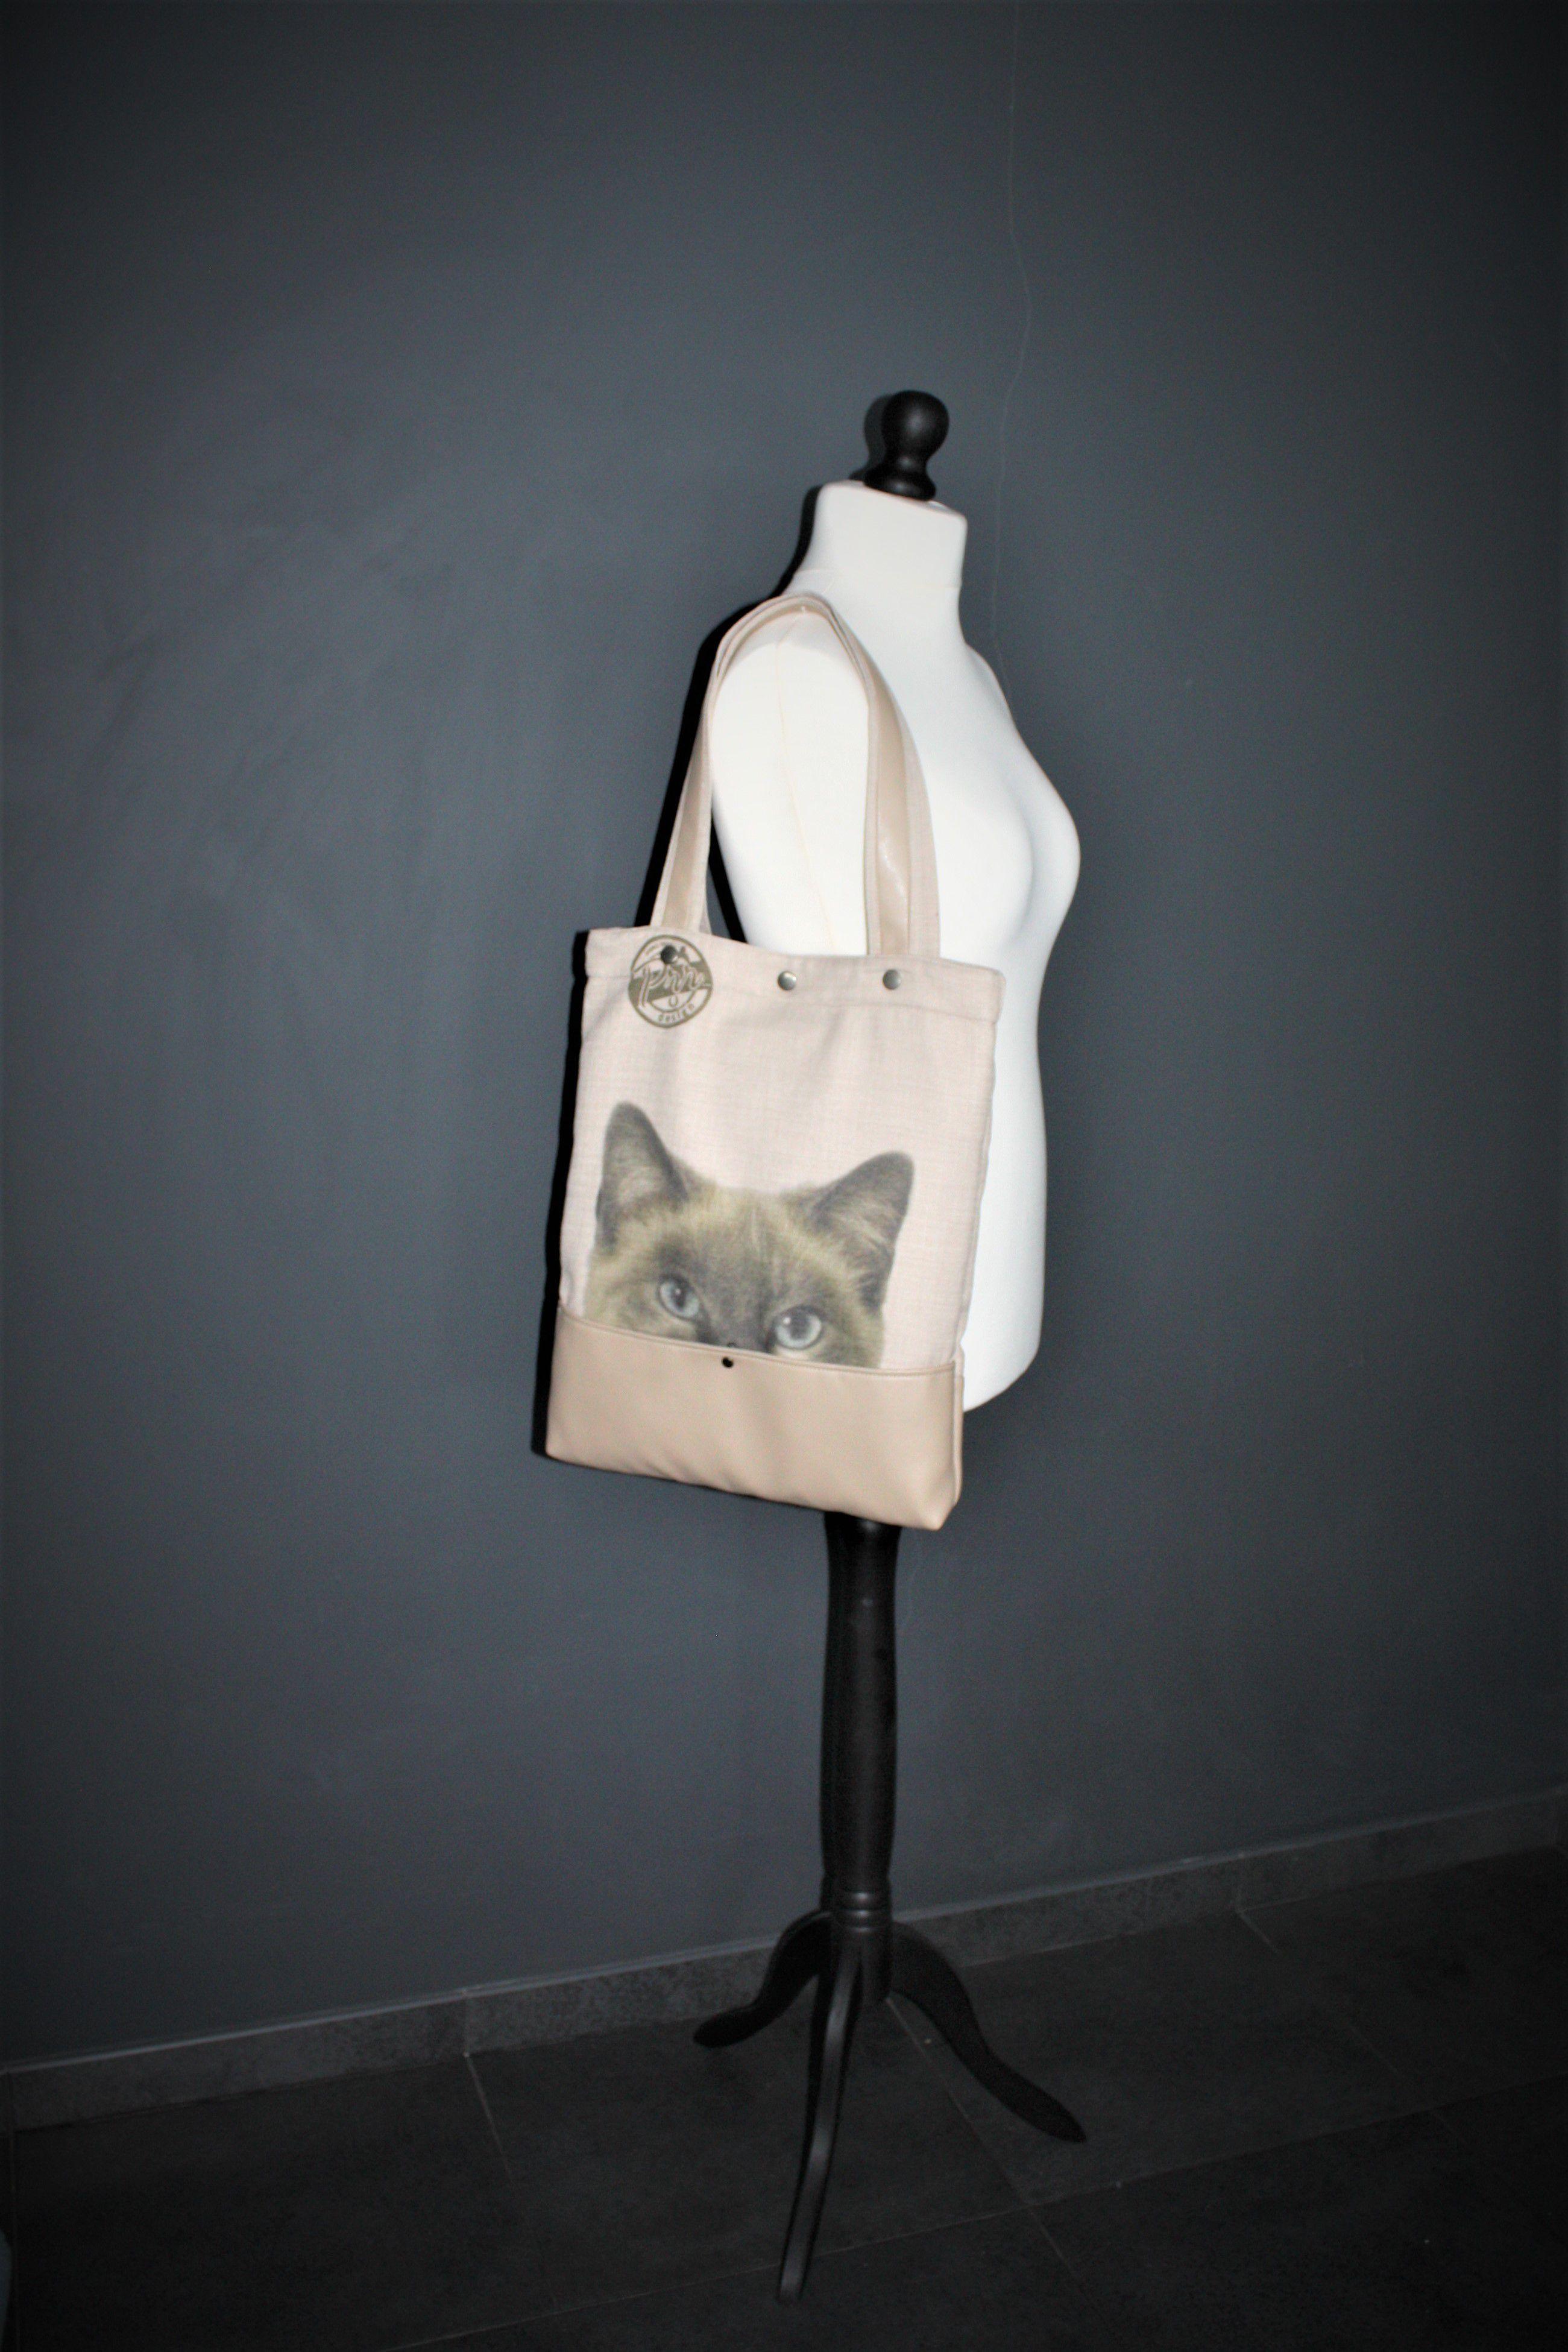 bag shopping cat gift big daily tote handbag handmade everyday